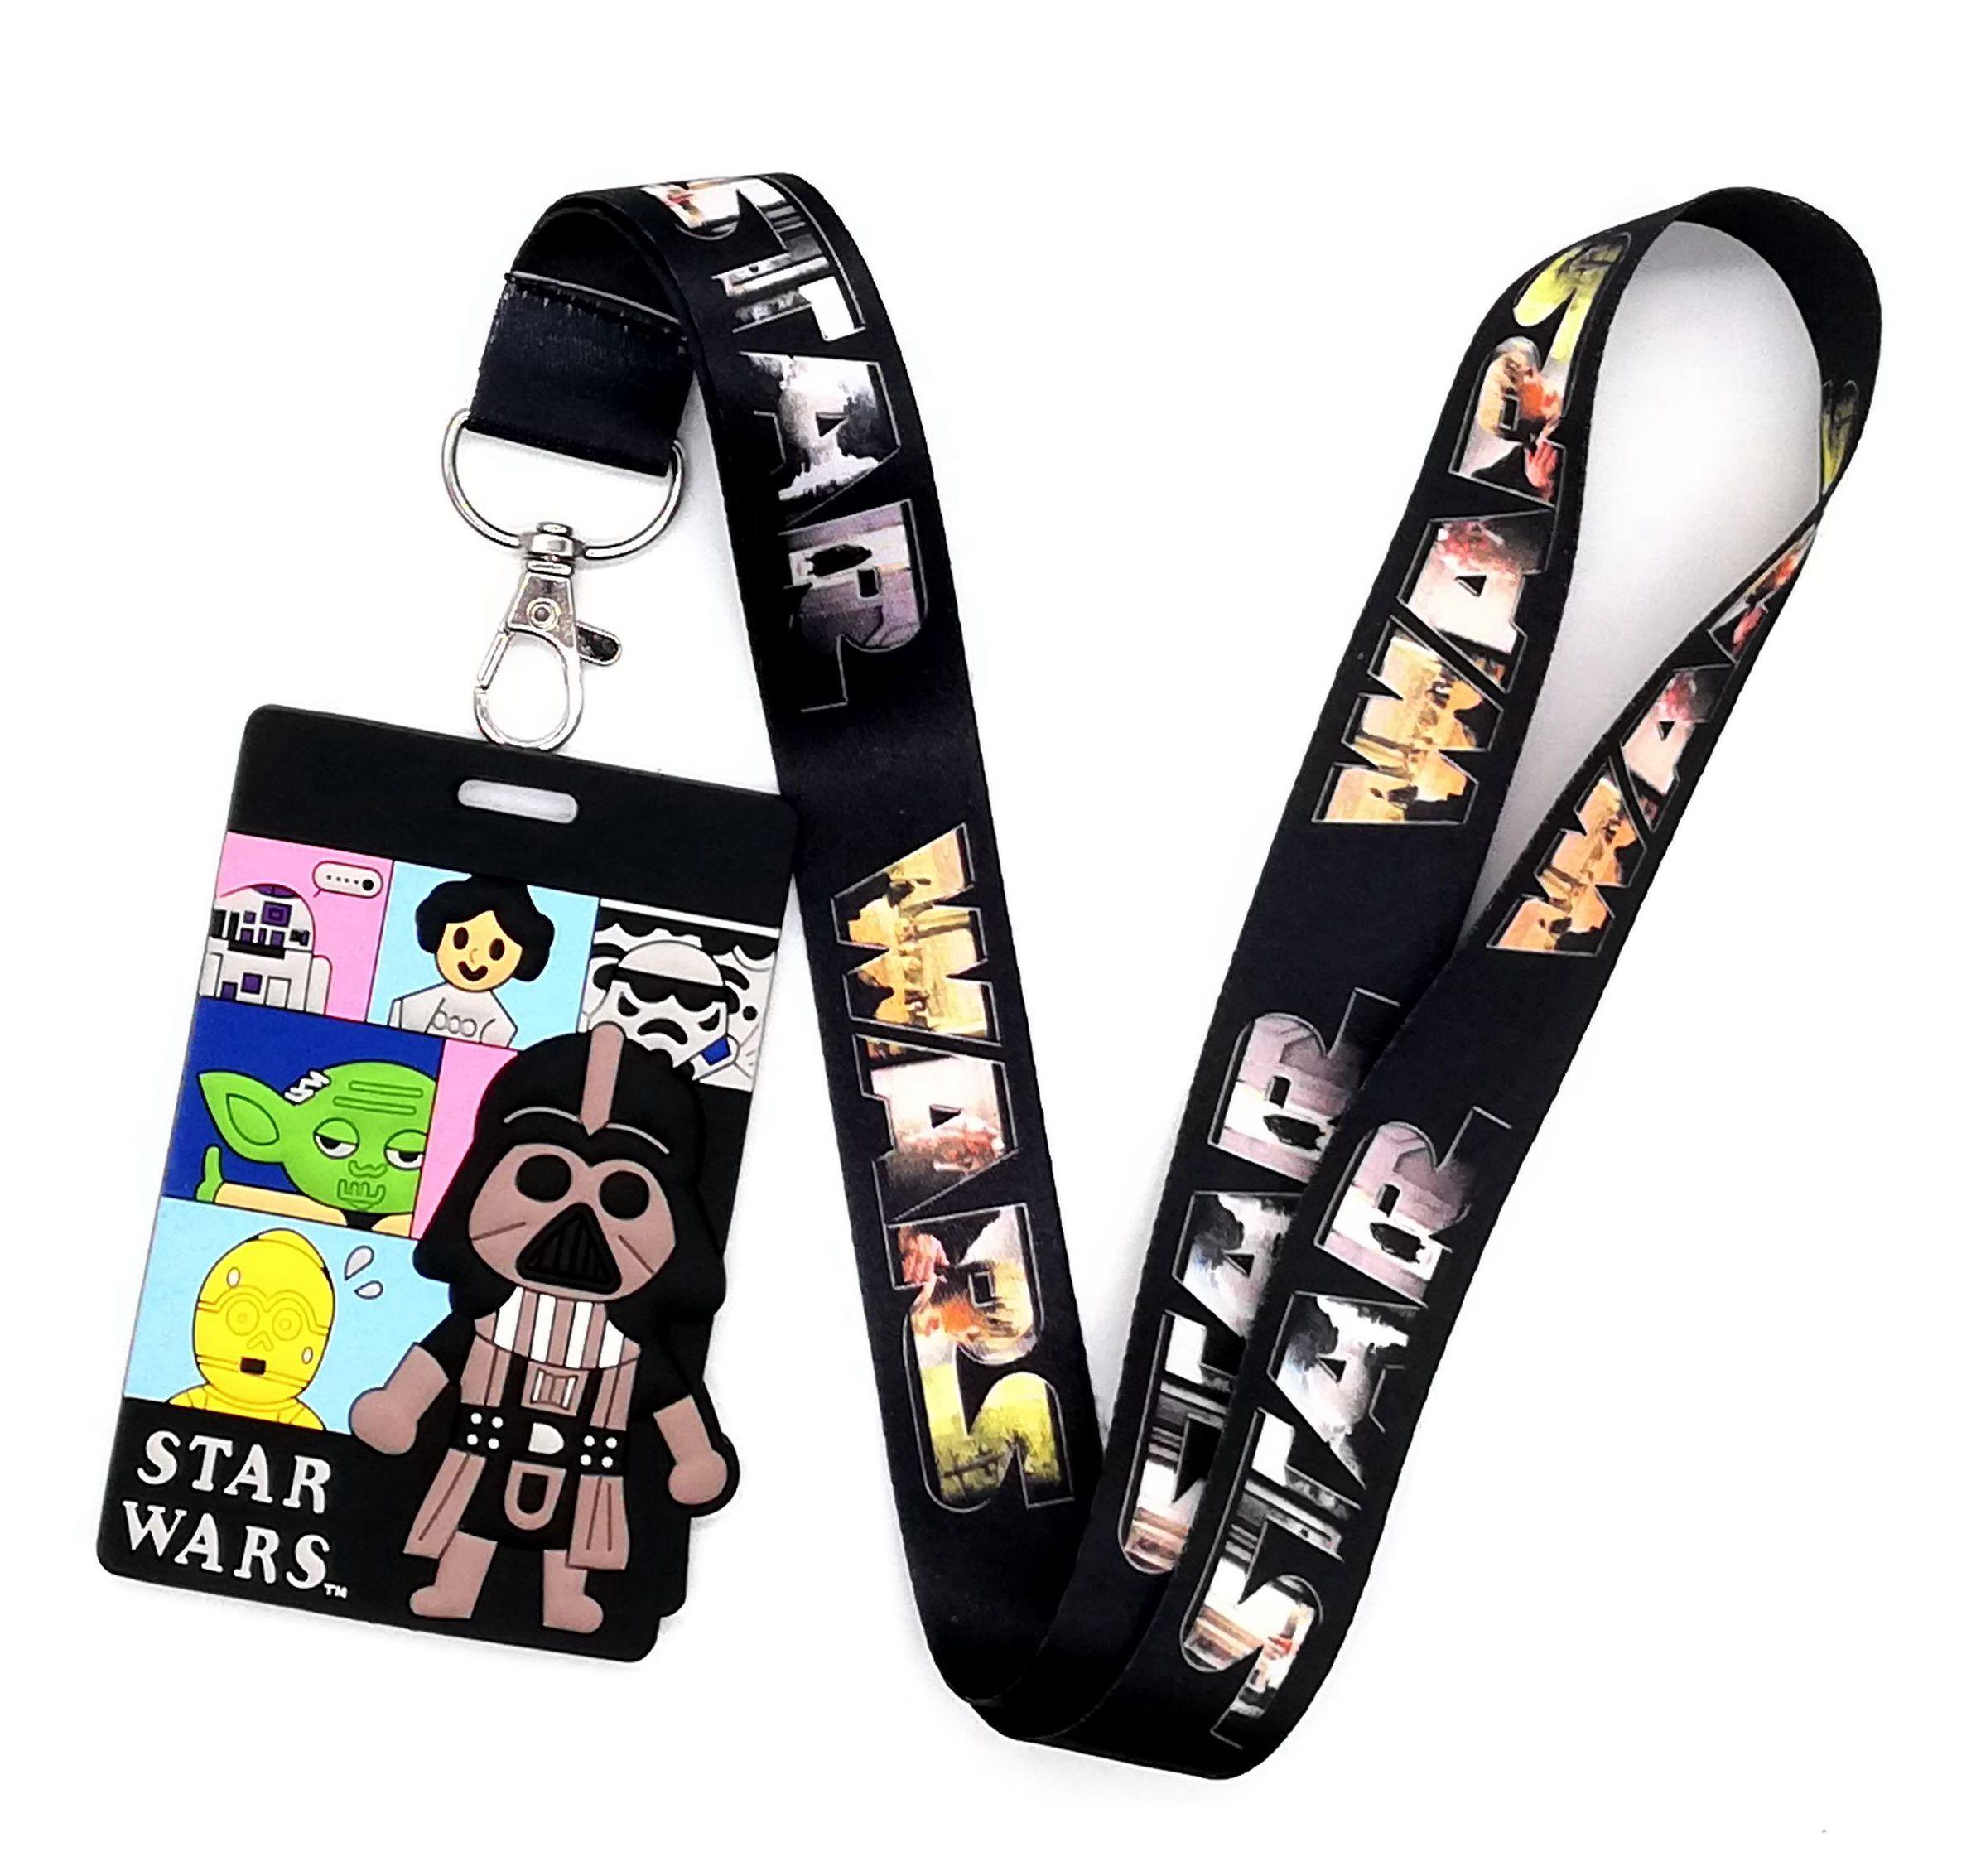 Hot 1 Pcs Cartoon Star Wars   Lanyard Key Lanyard Cosplay Badge ID Cards Holders Neck Straps Keyrchains